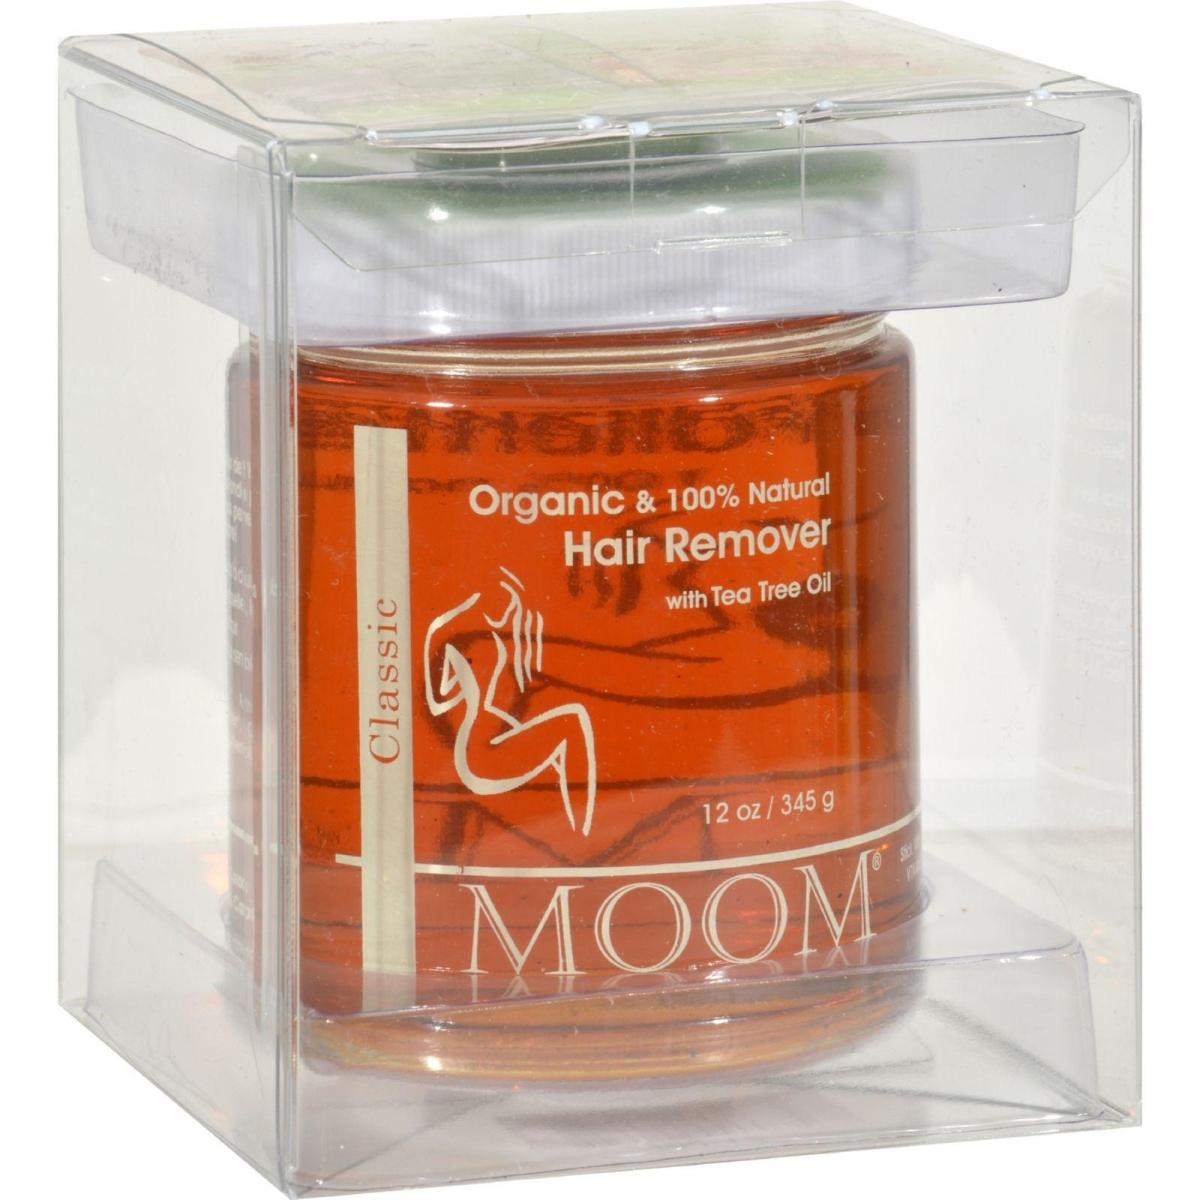 Moom HG0166892 12 oz Organic Hair Removal with Tea Tree Refill Jar